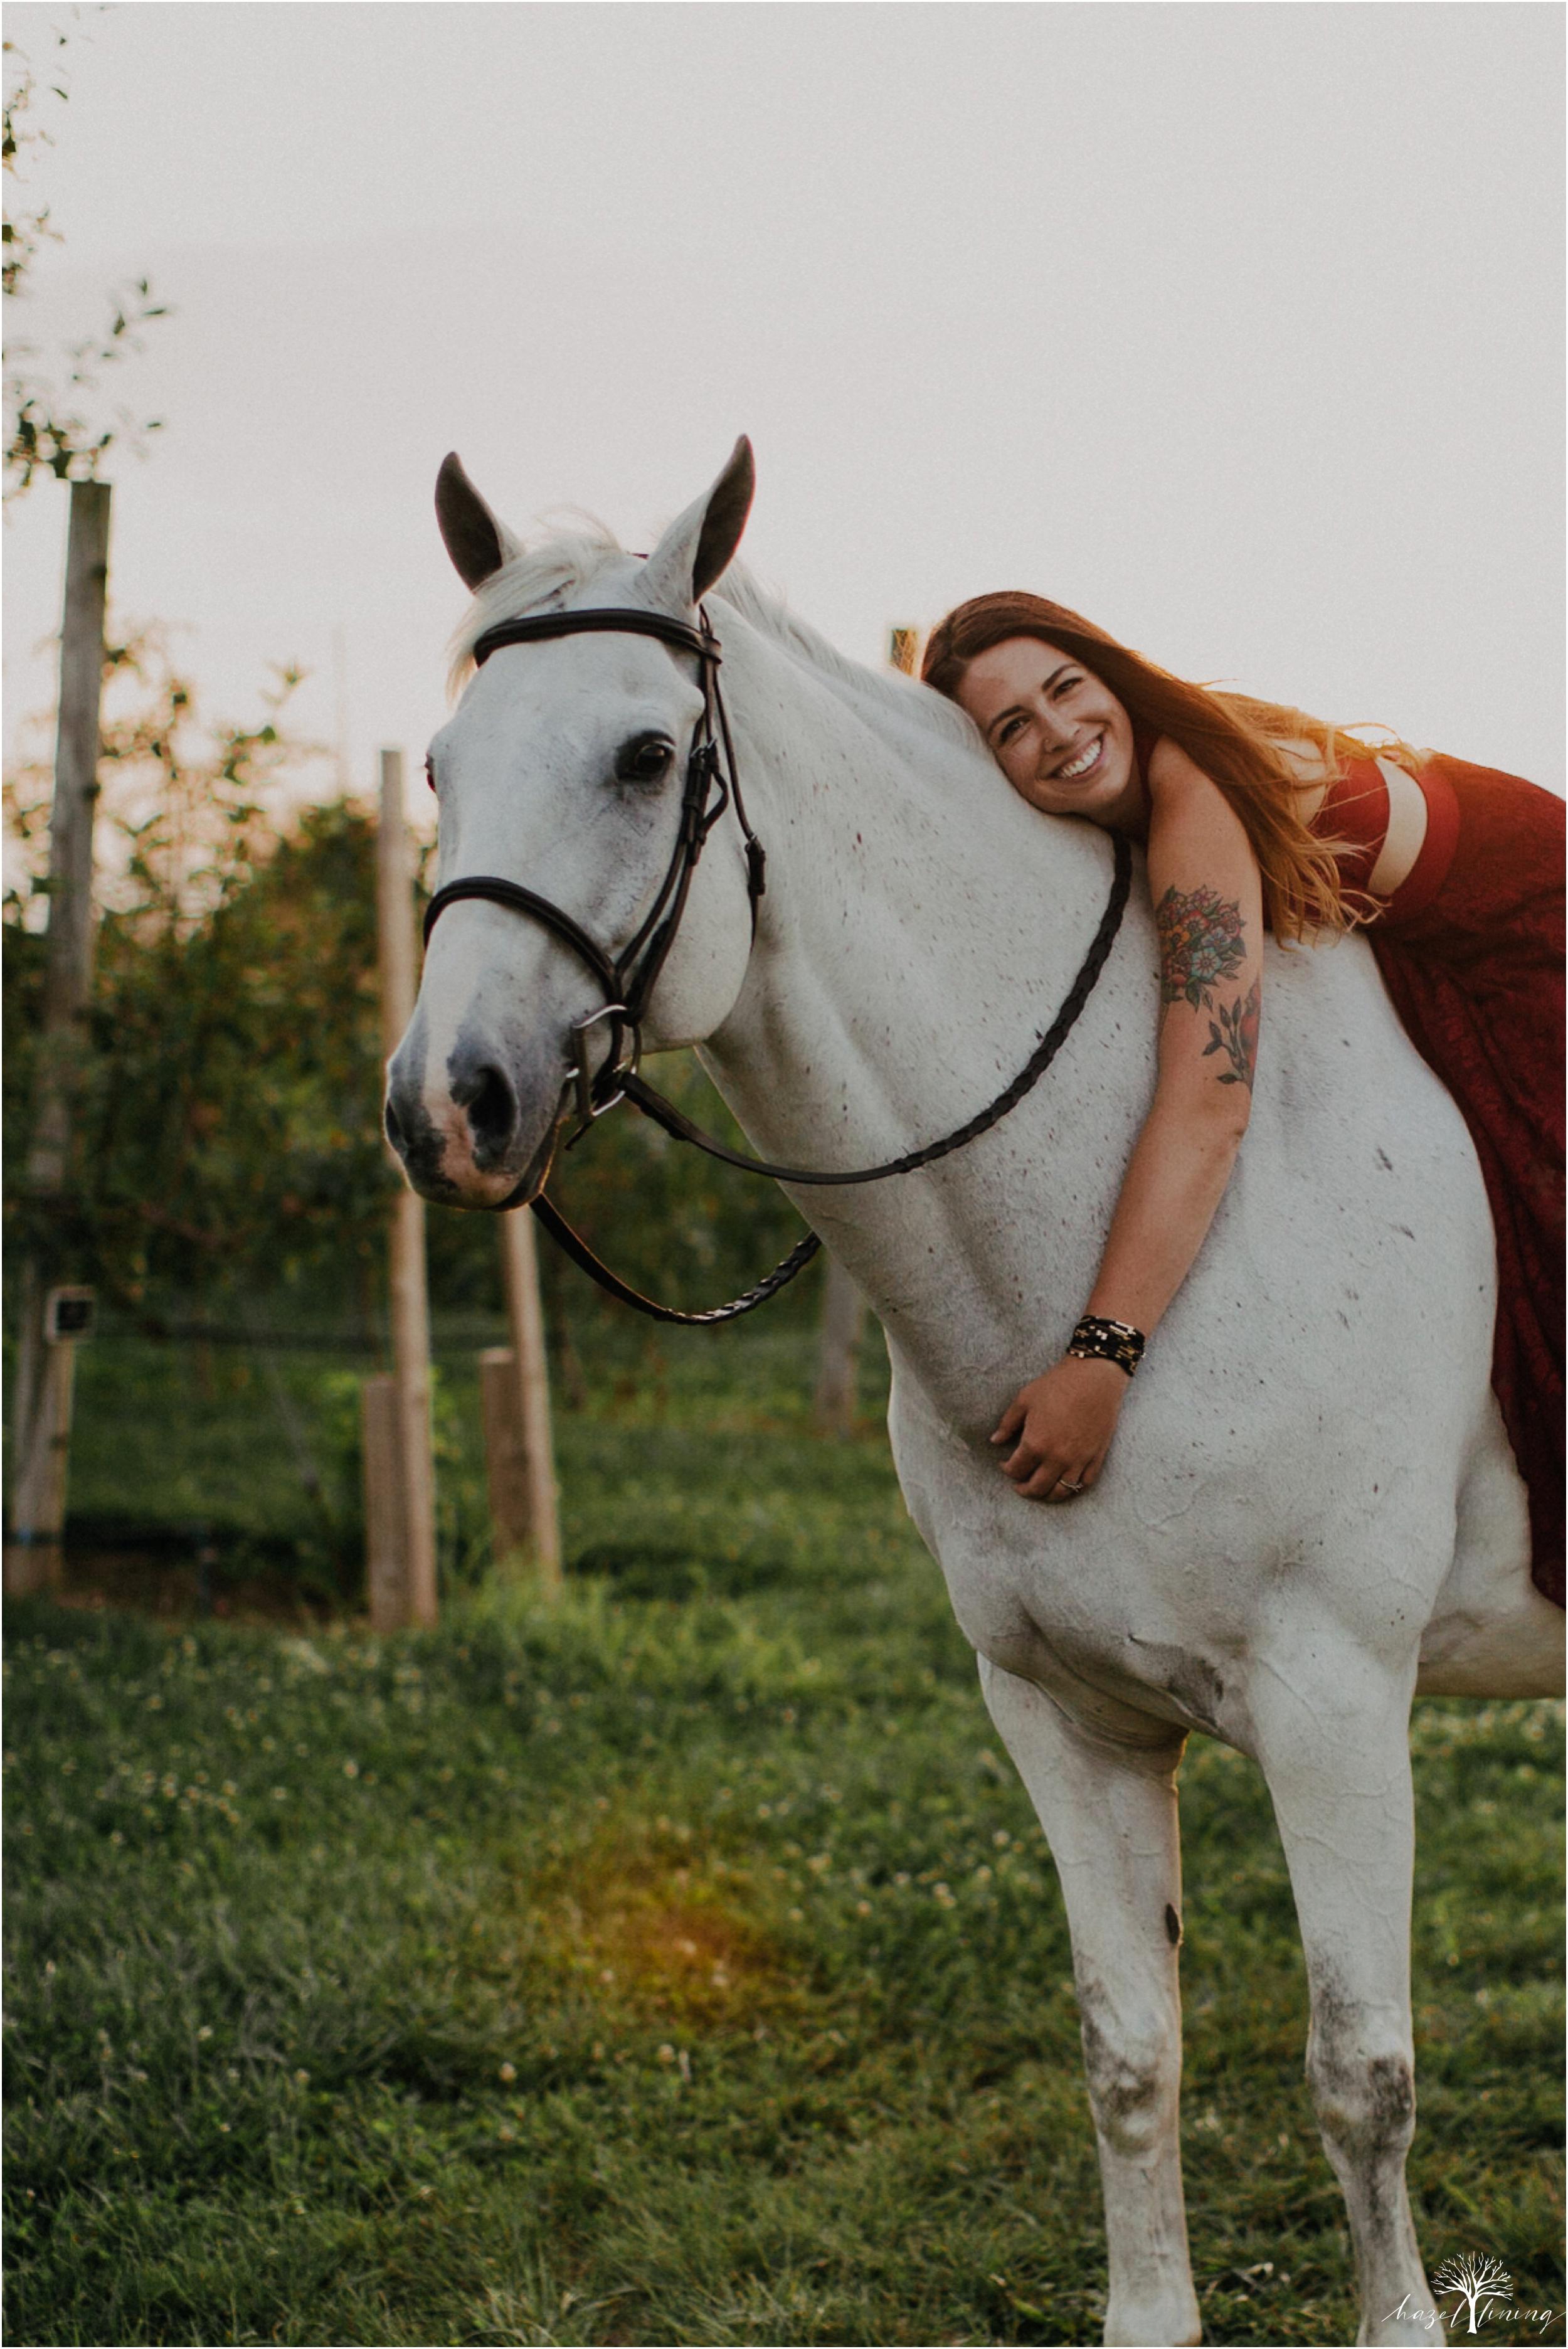 taylor-adams-and-horse-delaware-valley-university-delval-summer-equestrian-portrait-session-hazel-lining-photography-destination-elopement-wedding-engagement-photography_0072.jpg